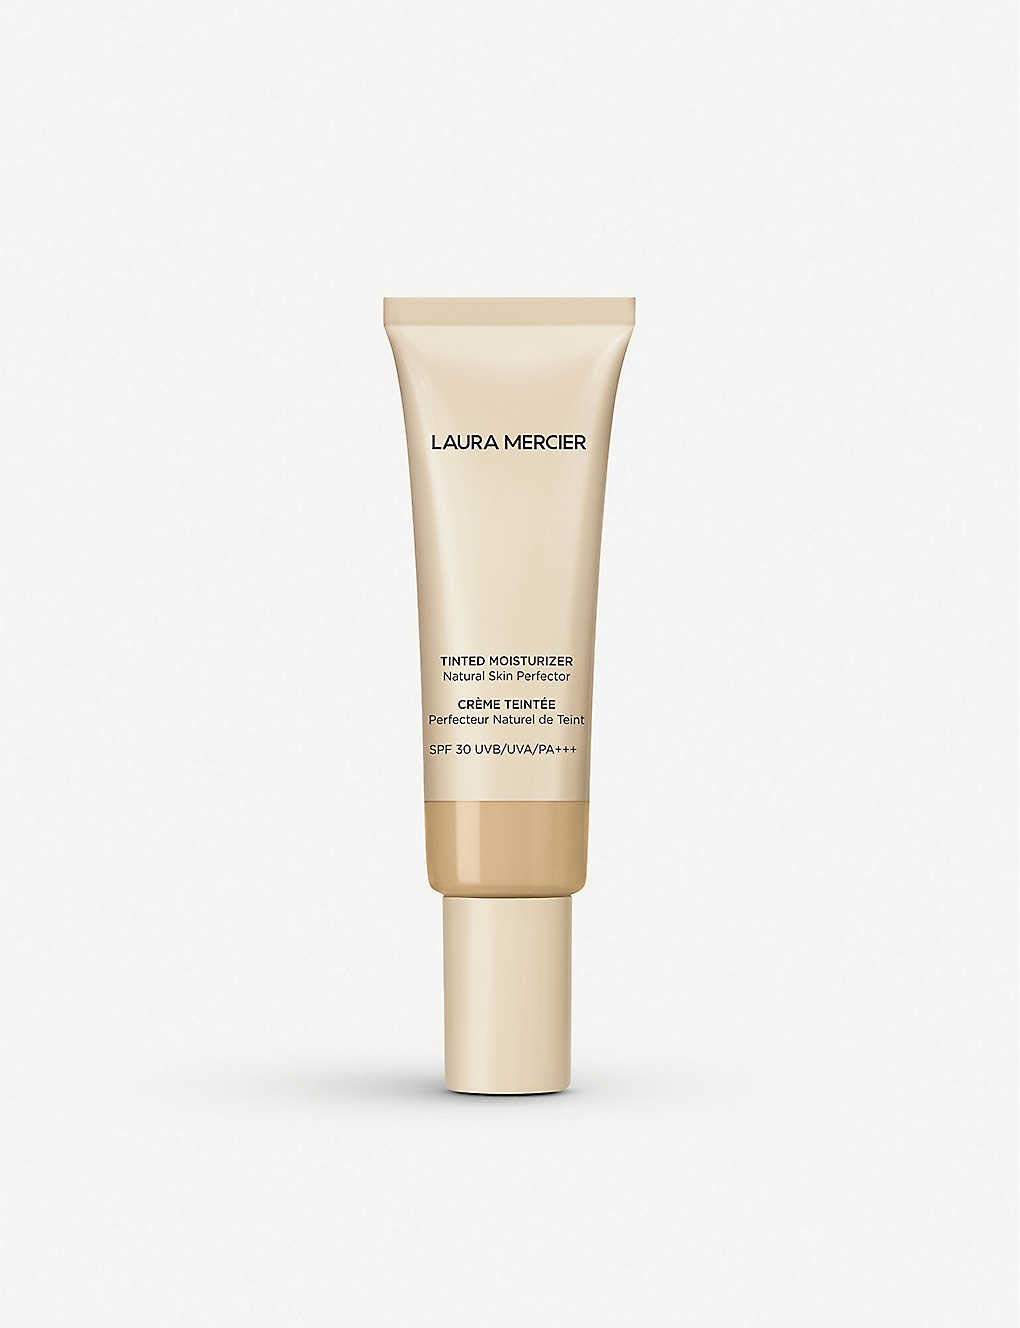 Laura Mercier Tinted Moisturizer Natural Skin Perfector SPF 30, #2W1 Natural, 1.7 oz